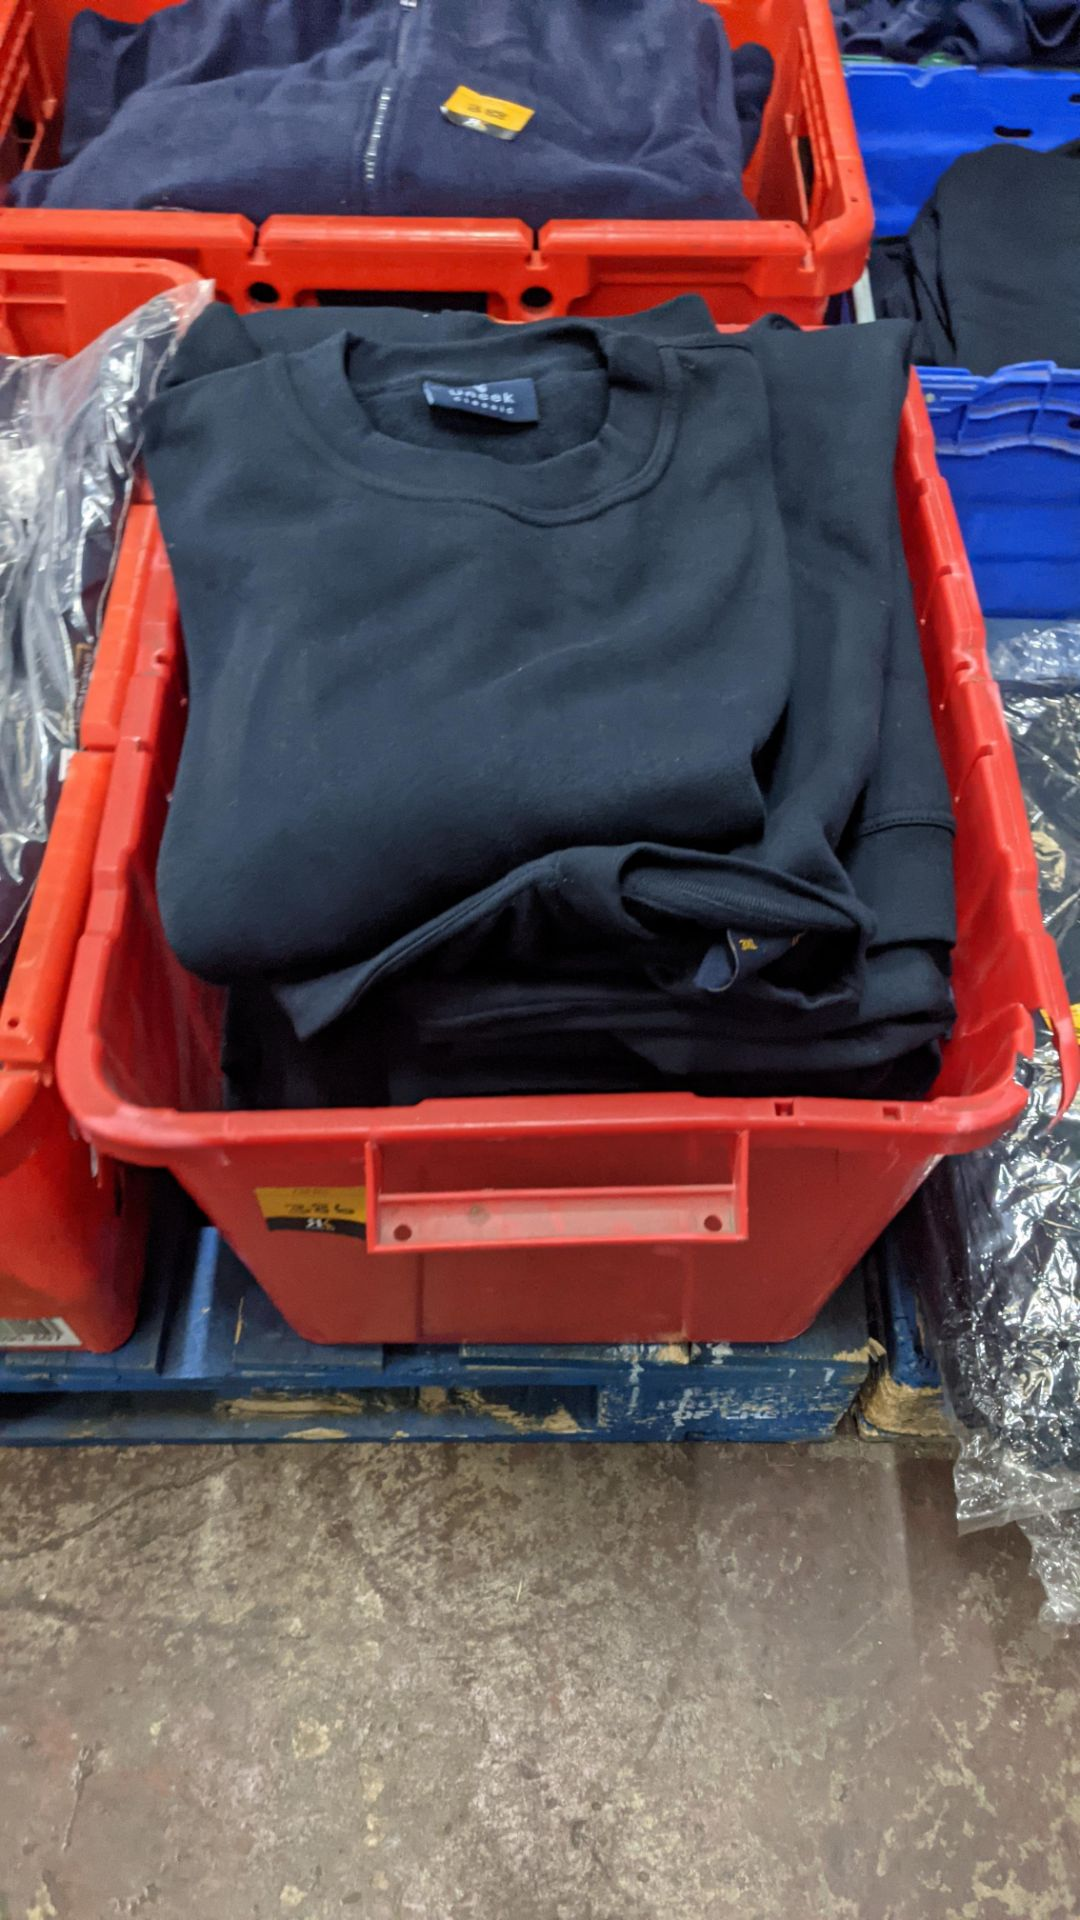 Approx 12 off navy sweatshirts - Image 2 of 5